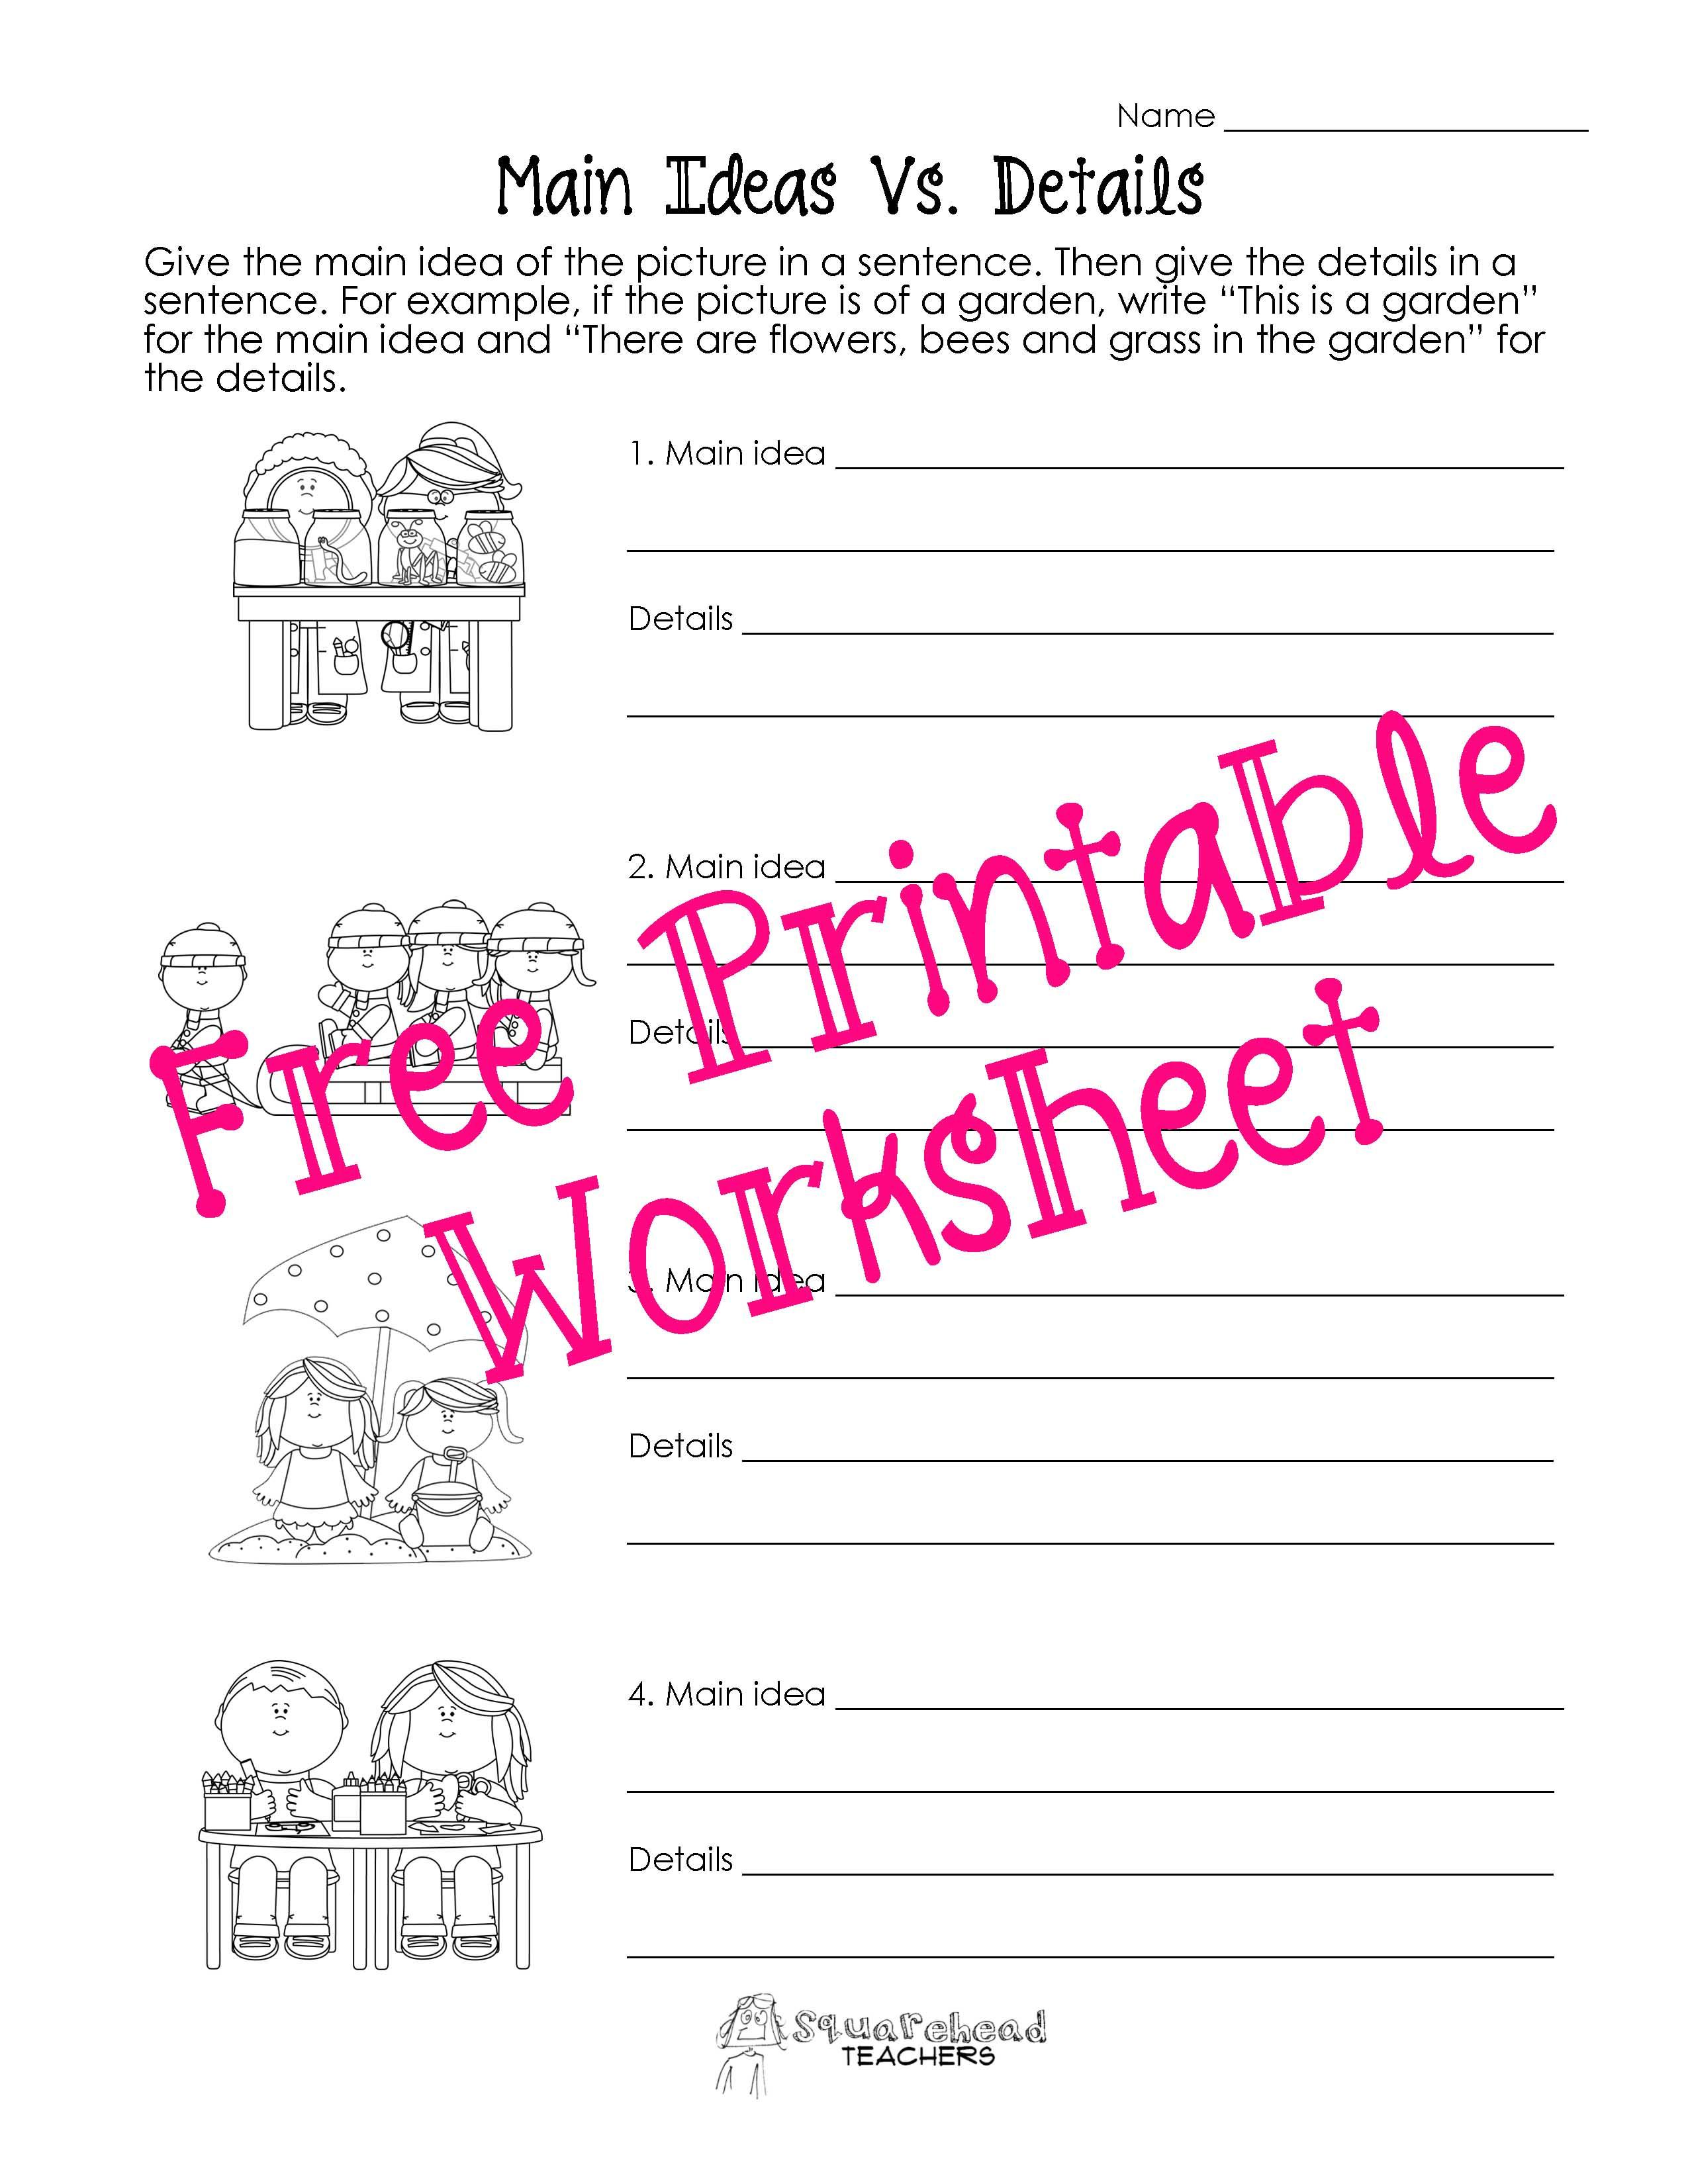 Main Idea Vs. Details Worksheets | Squarehead Teachers - Free Printable Main Idea Worksheets